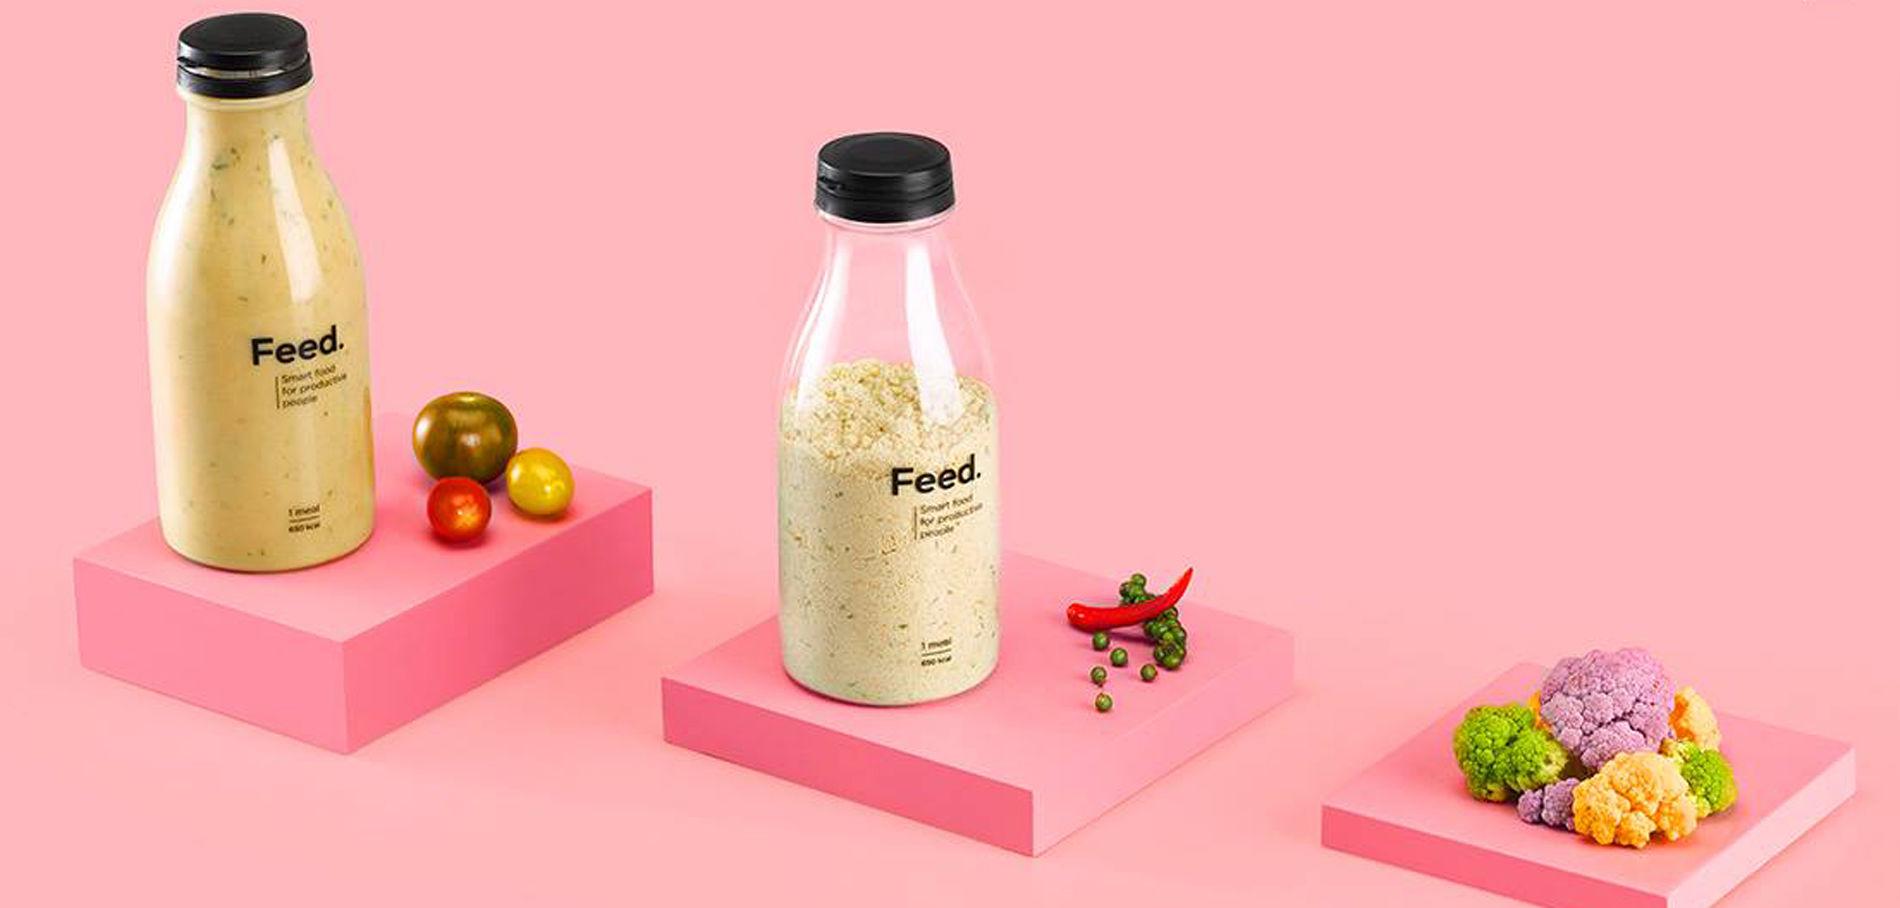 Feed - Tendances food de quoi va-t-on parler en 2019?